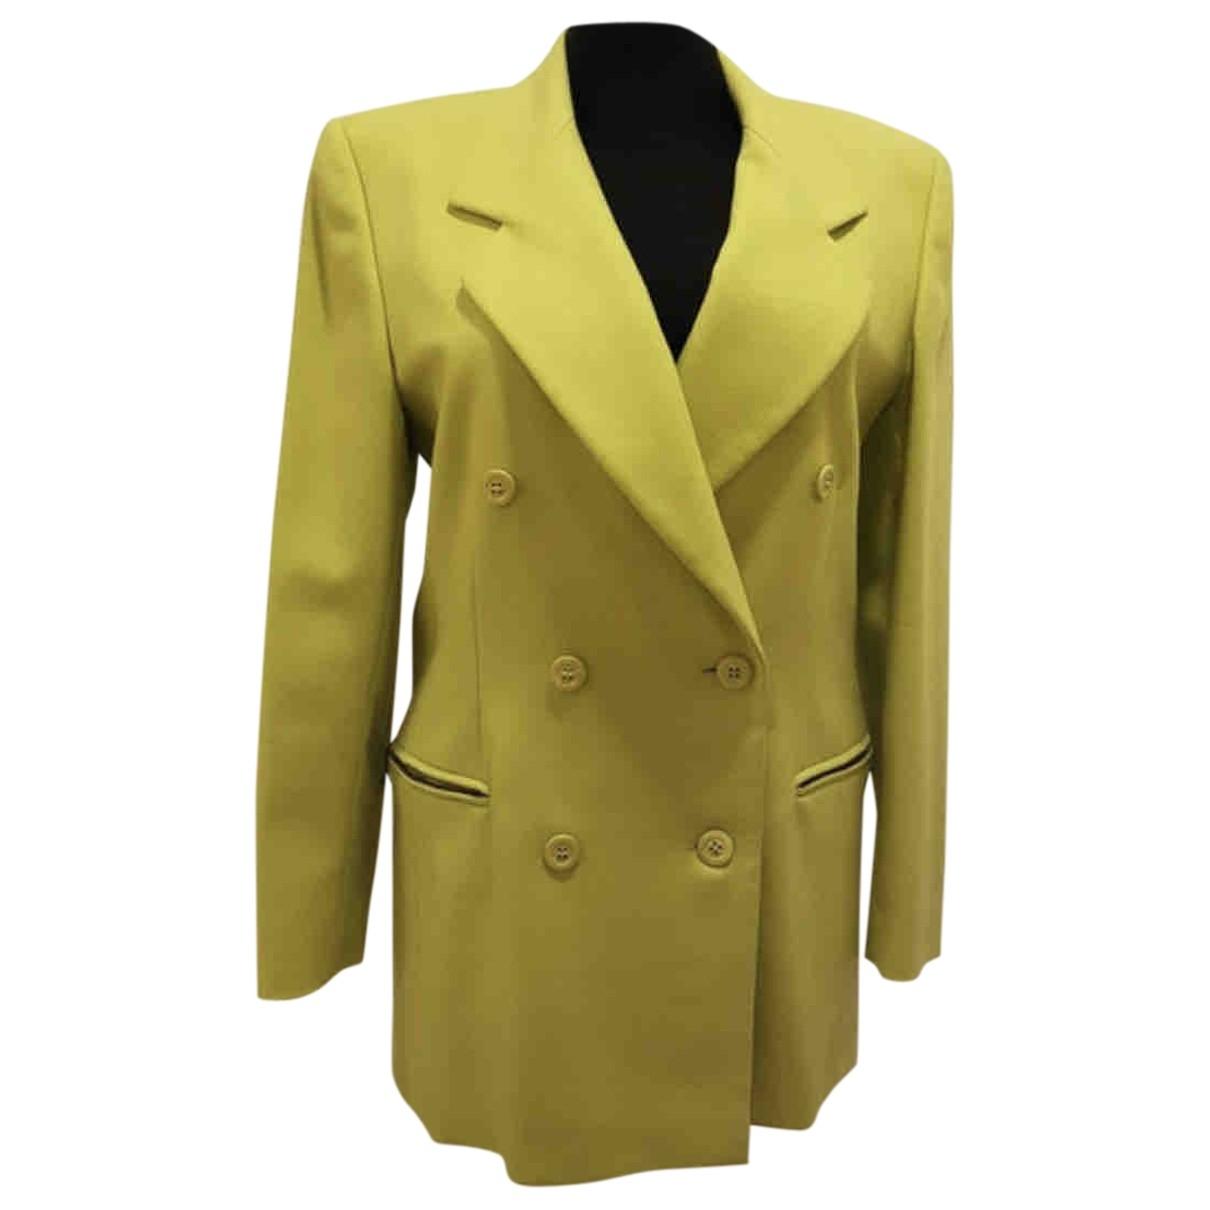 Escada \N Wool jacket for Women One Size 0-5